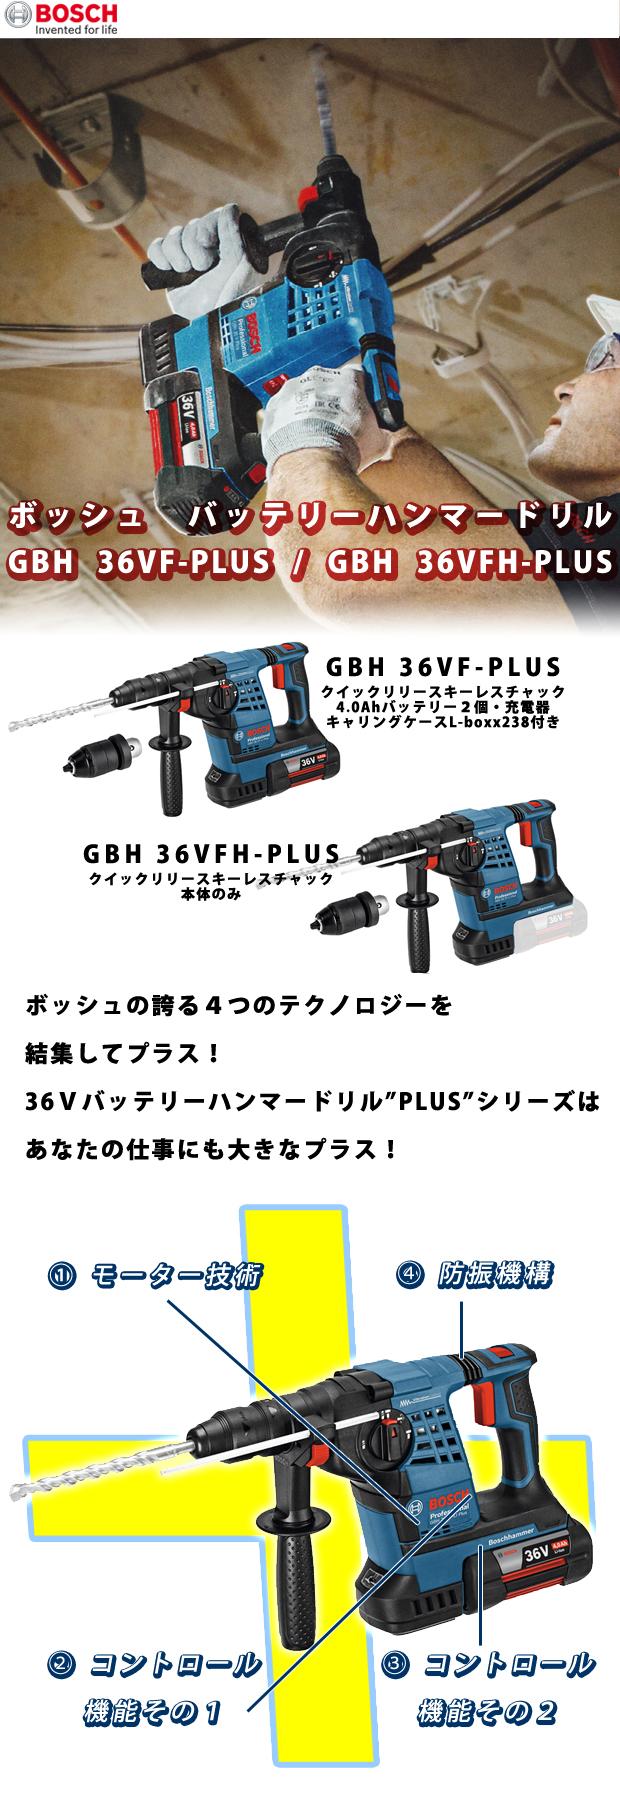 BOSCH バッテリーハンマードリル GBH 36VF-PLUS